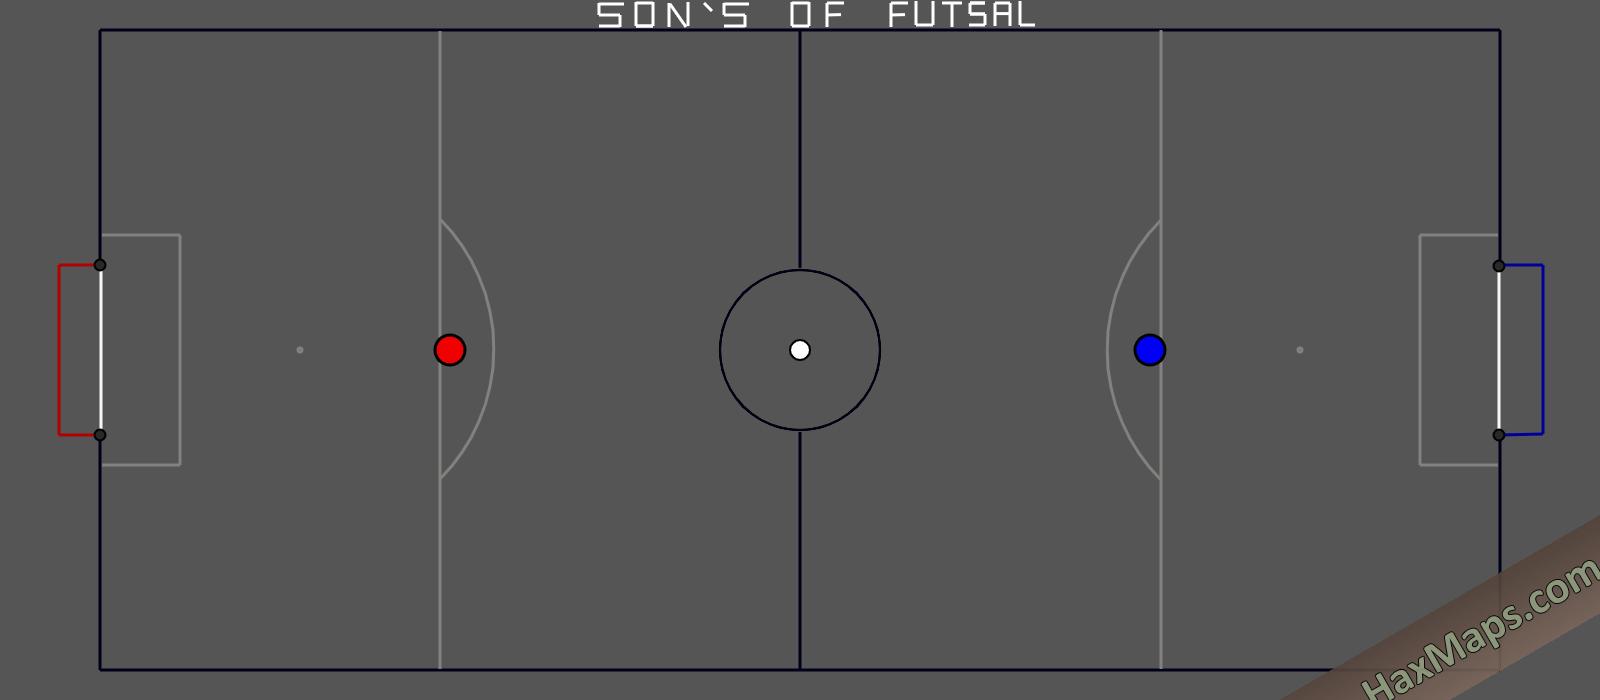 haxball maps   SOFv4